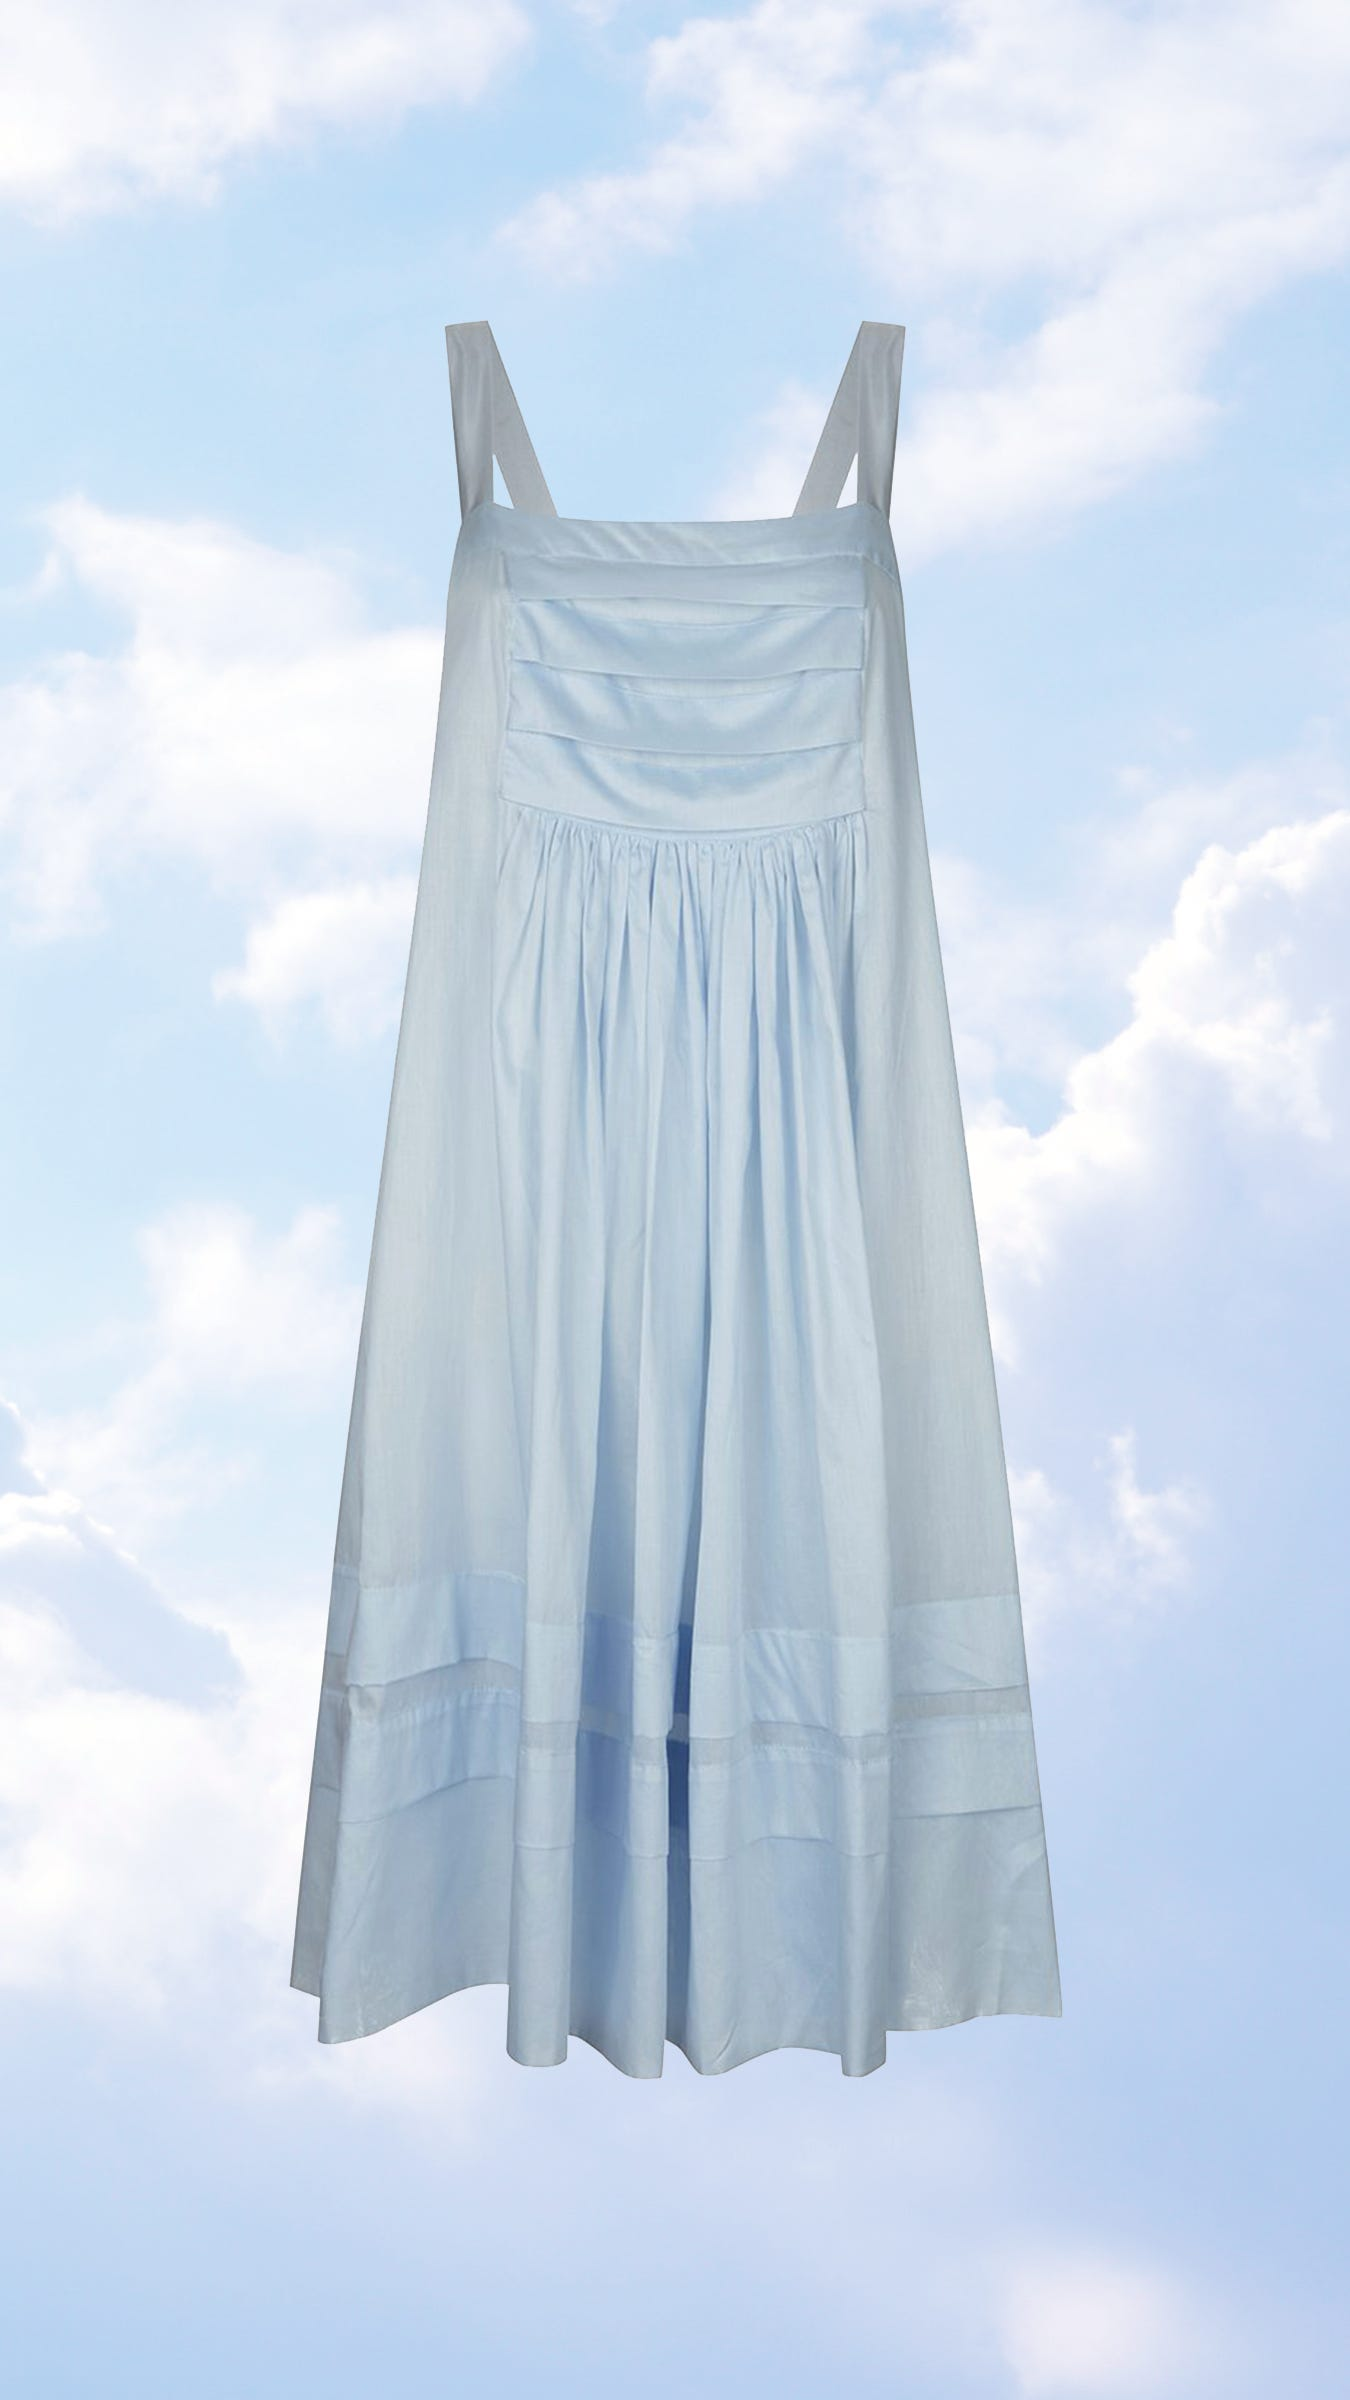 Chic Pajama Dresses And Nightgowns Cute Pjs Jolie Clothing Dakota Long Dress